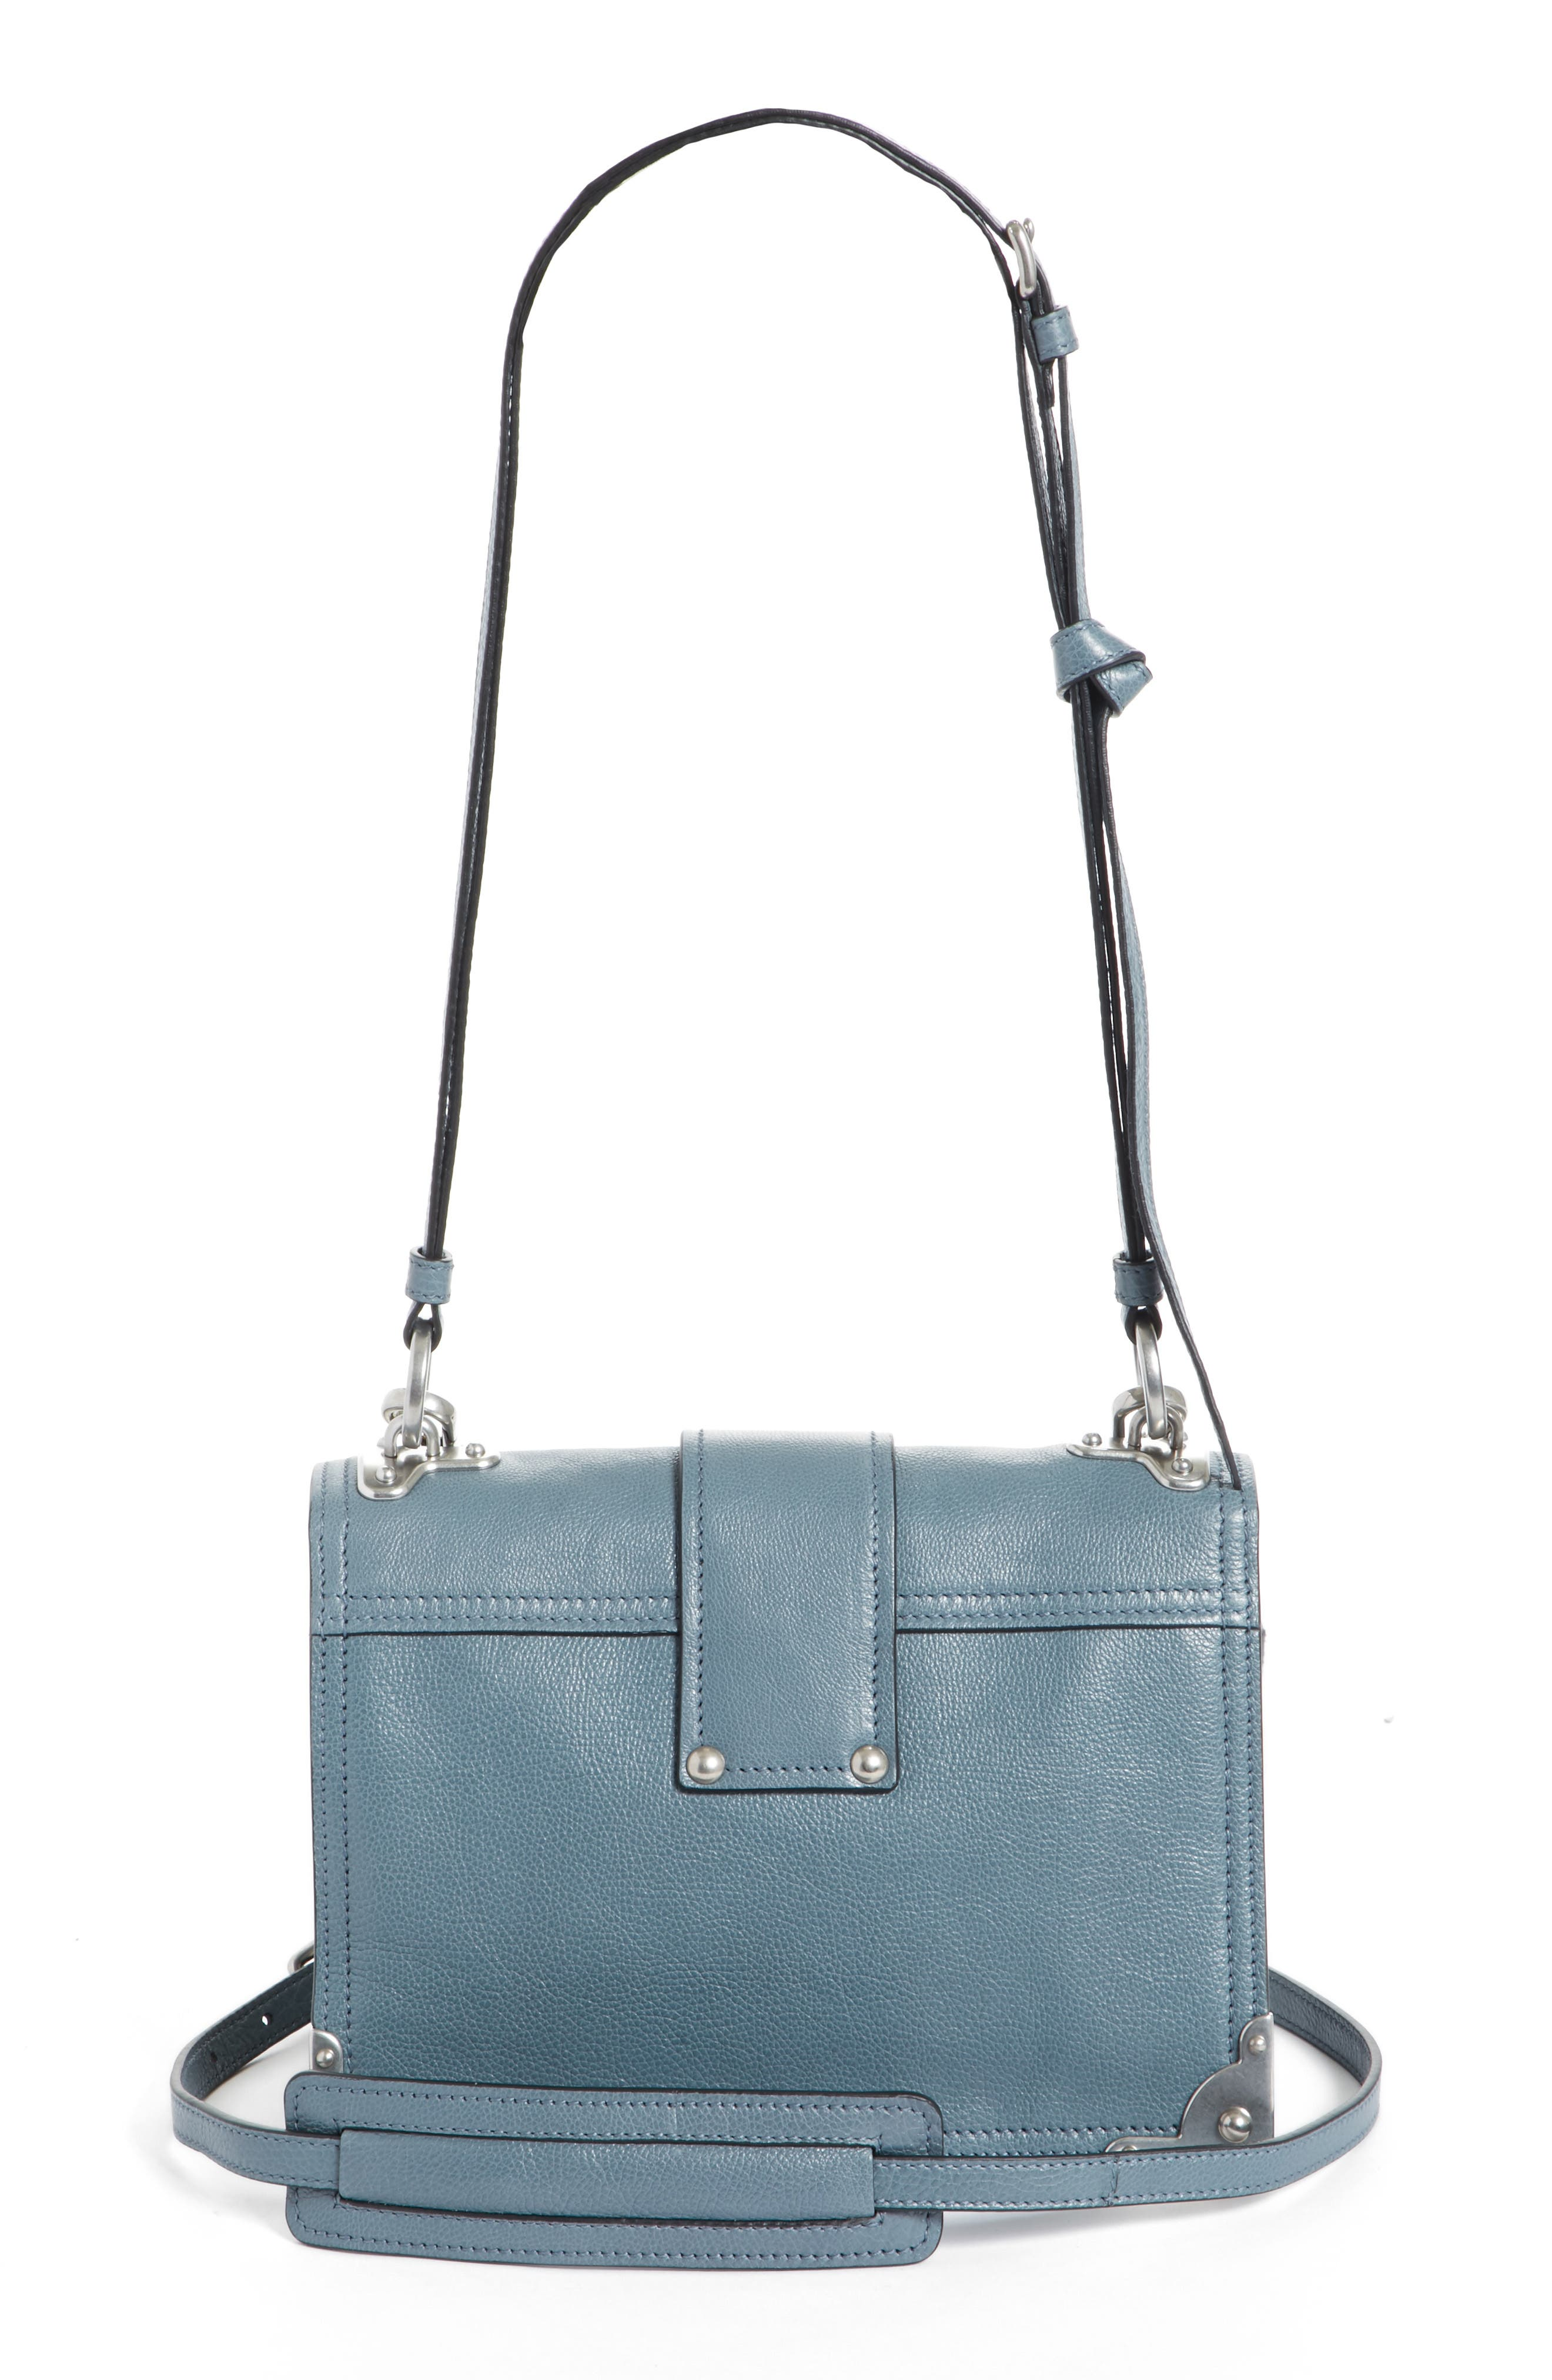 Cahier Glace Calfskin Convertible Shoulder Bag,                             Alternate thumbnail 3, color,                             MARINE/ ASTRALE 1